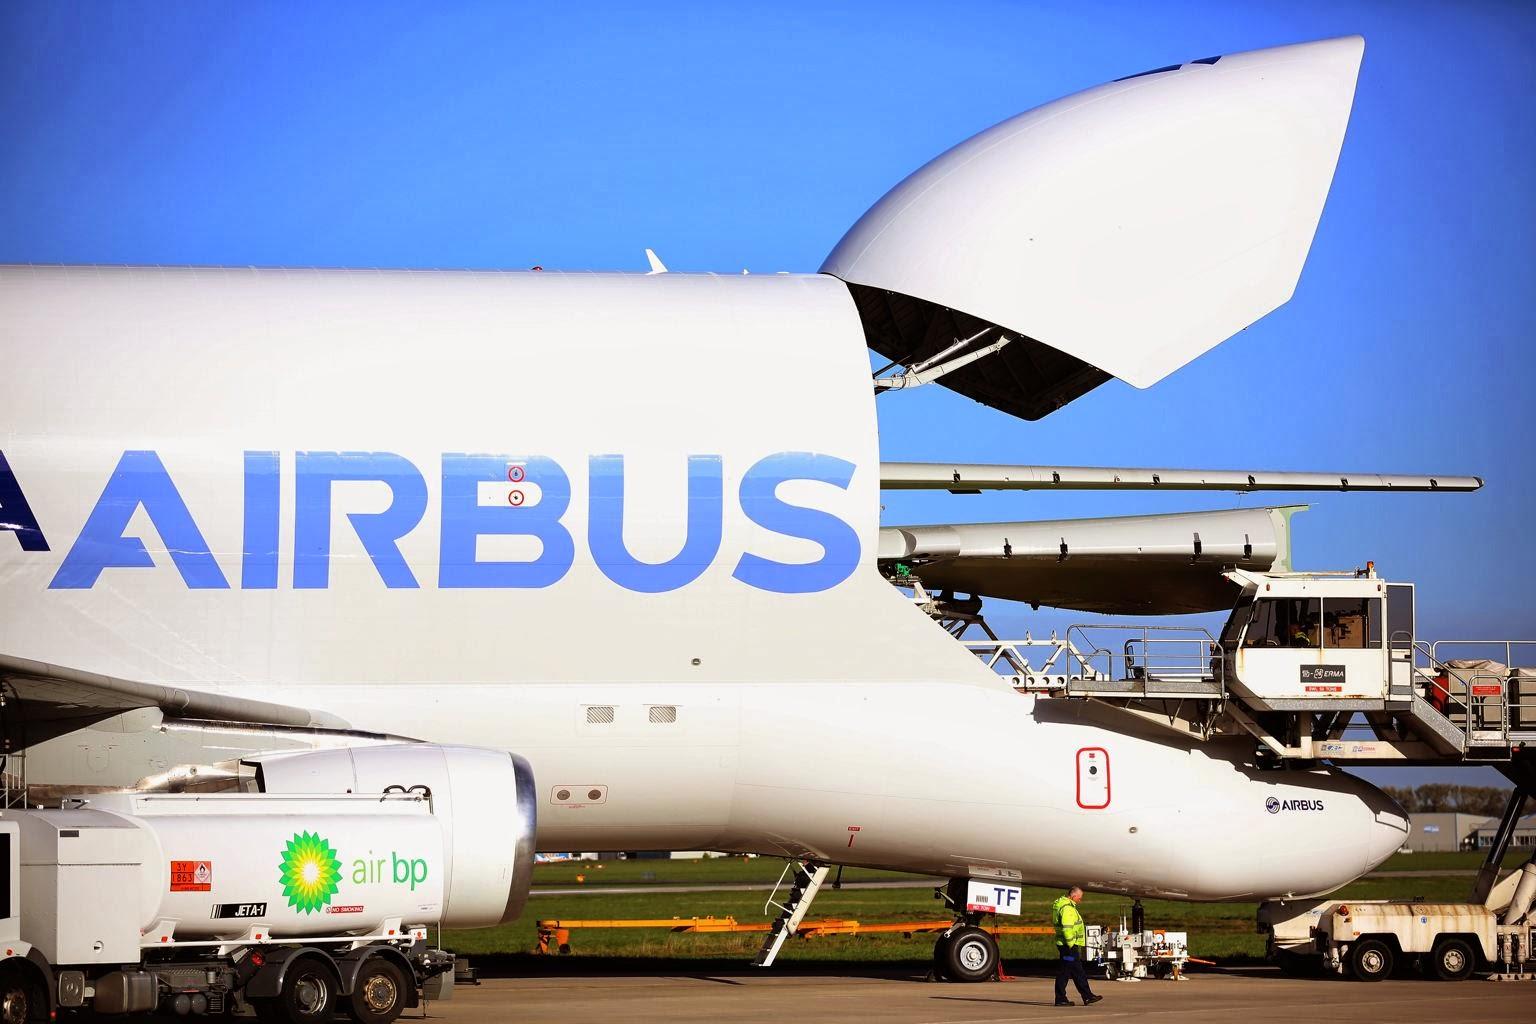 Image For أكبر طائرات العالم Biggest Planes